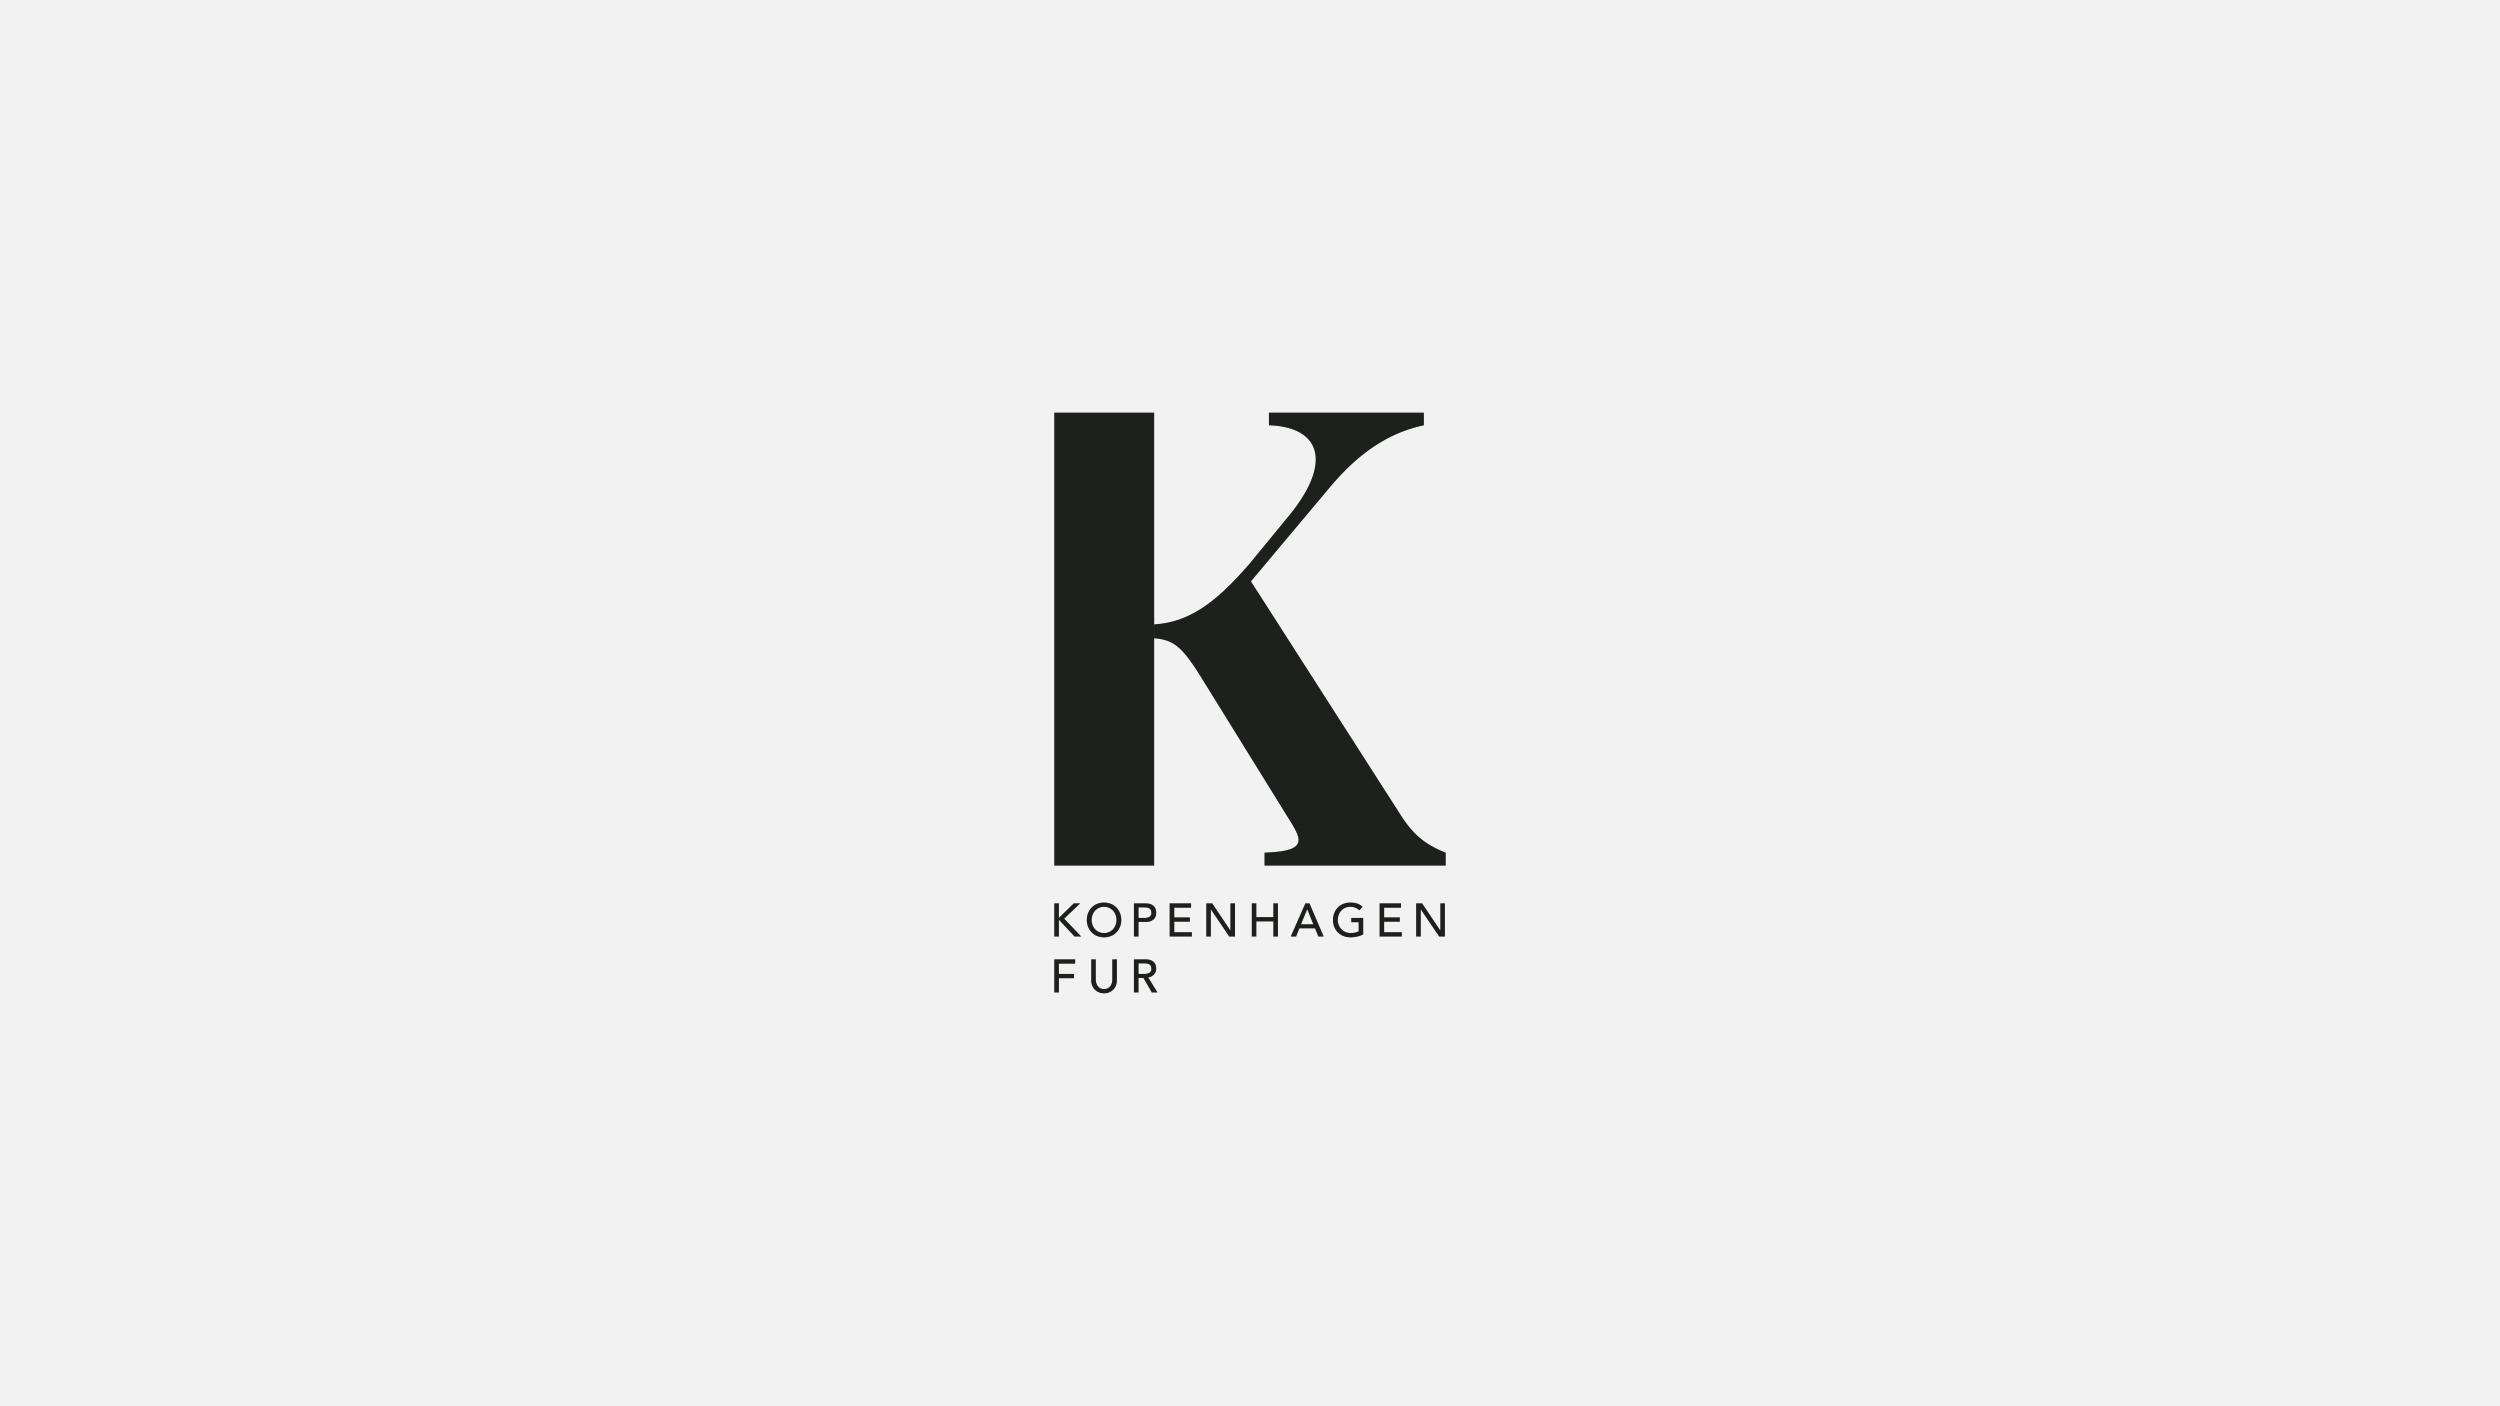 Logo_0012_Kopenhagen_Fur1